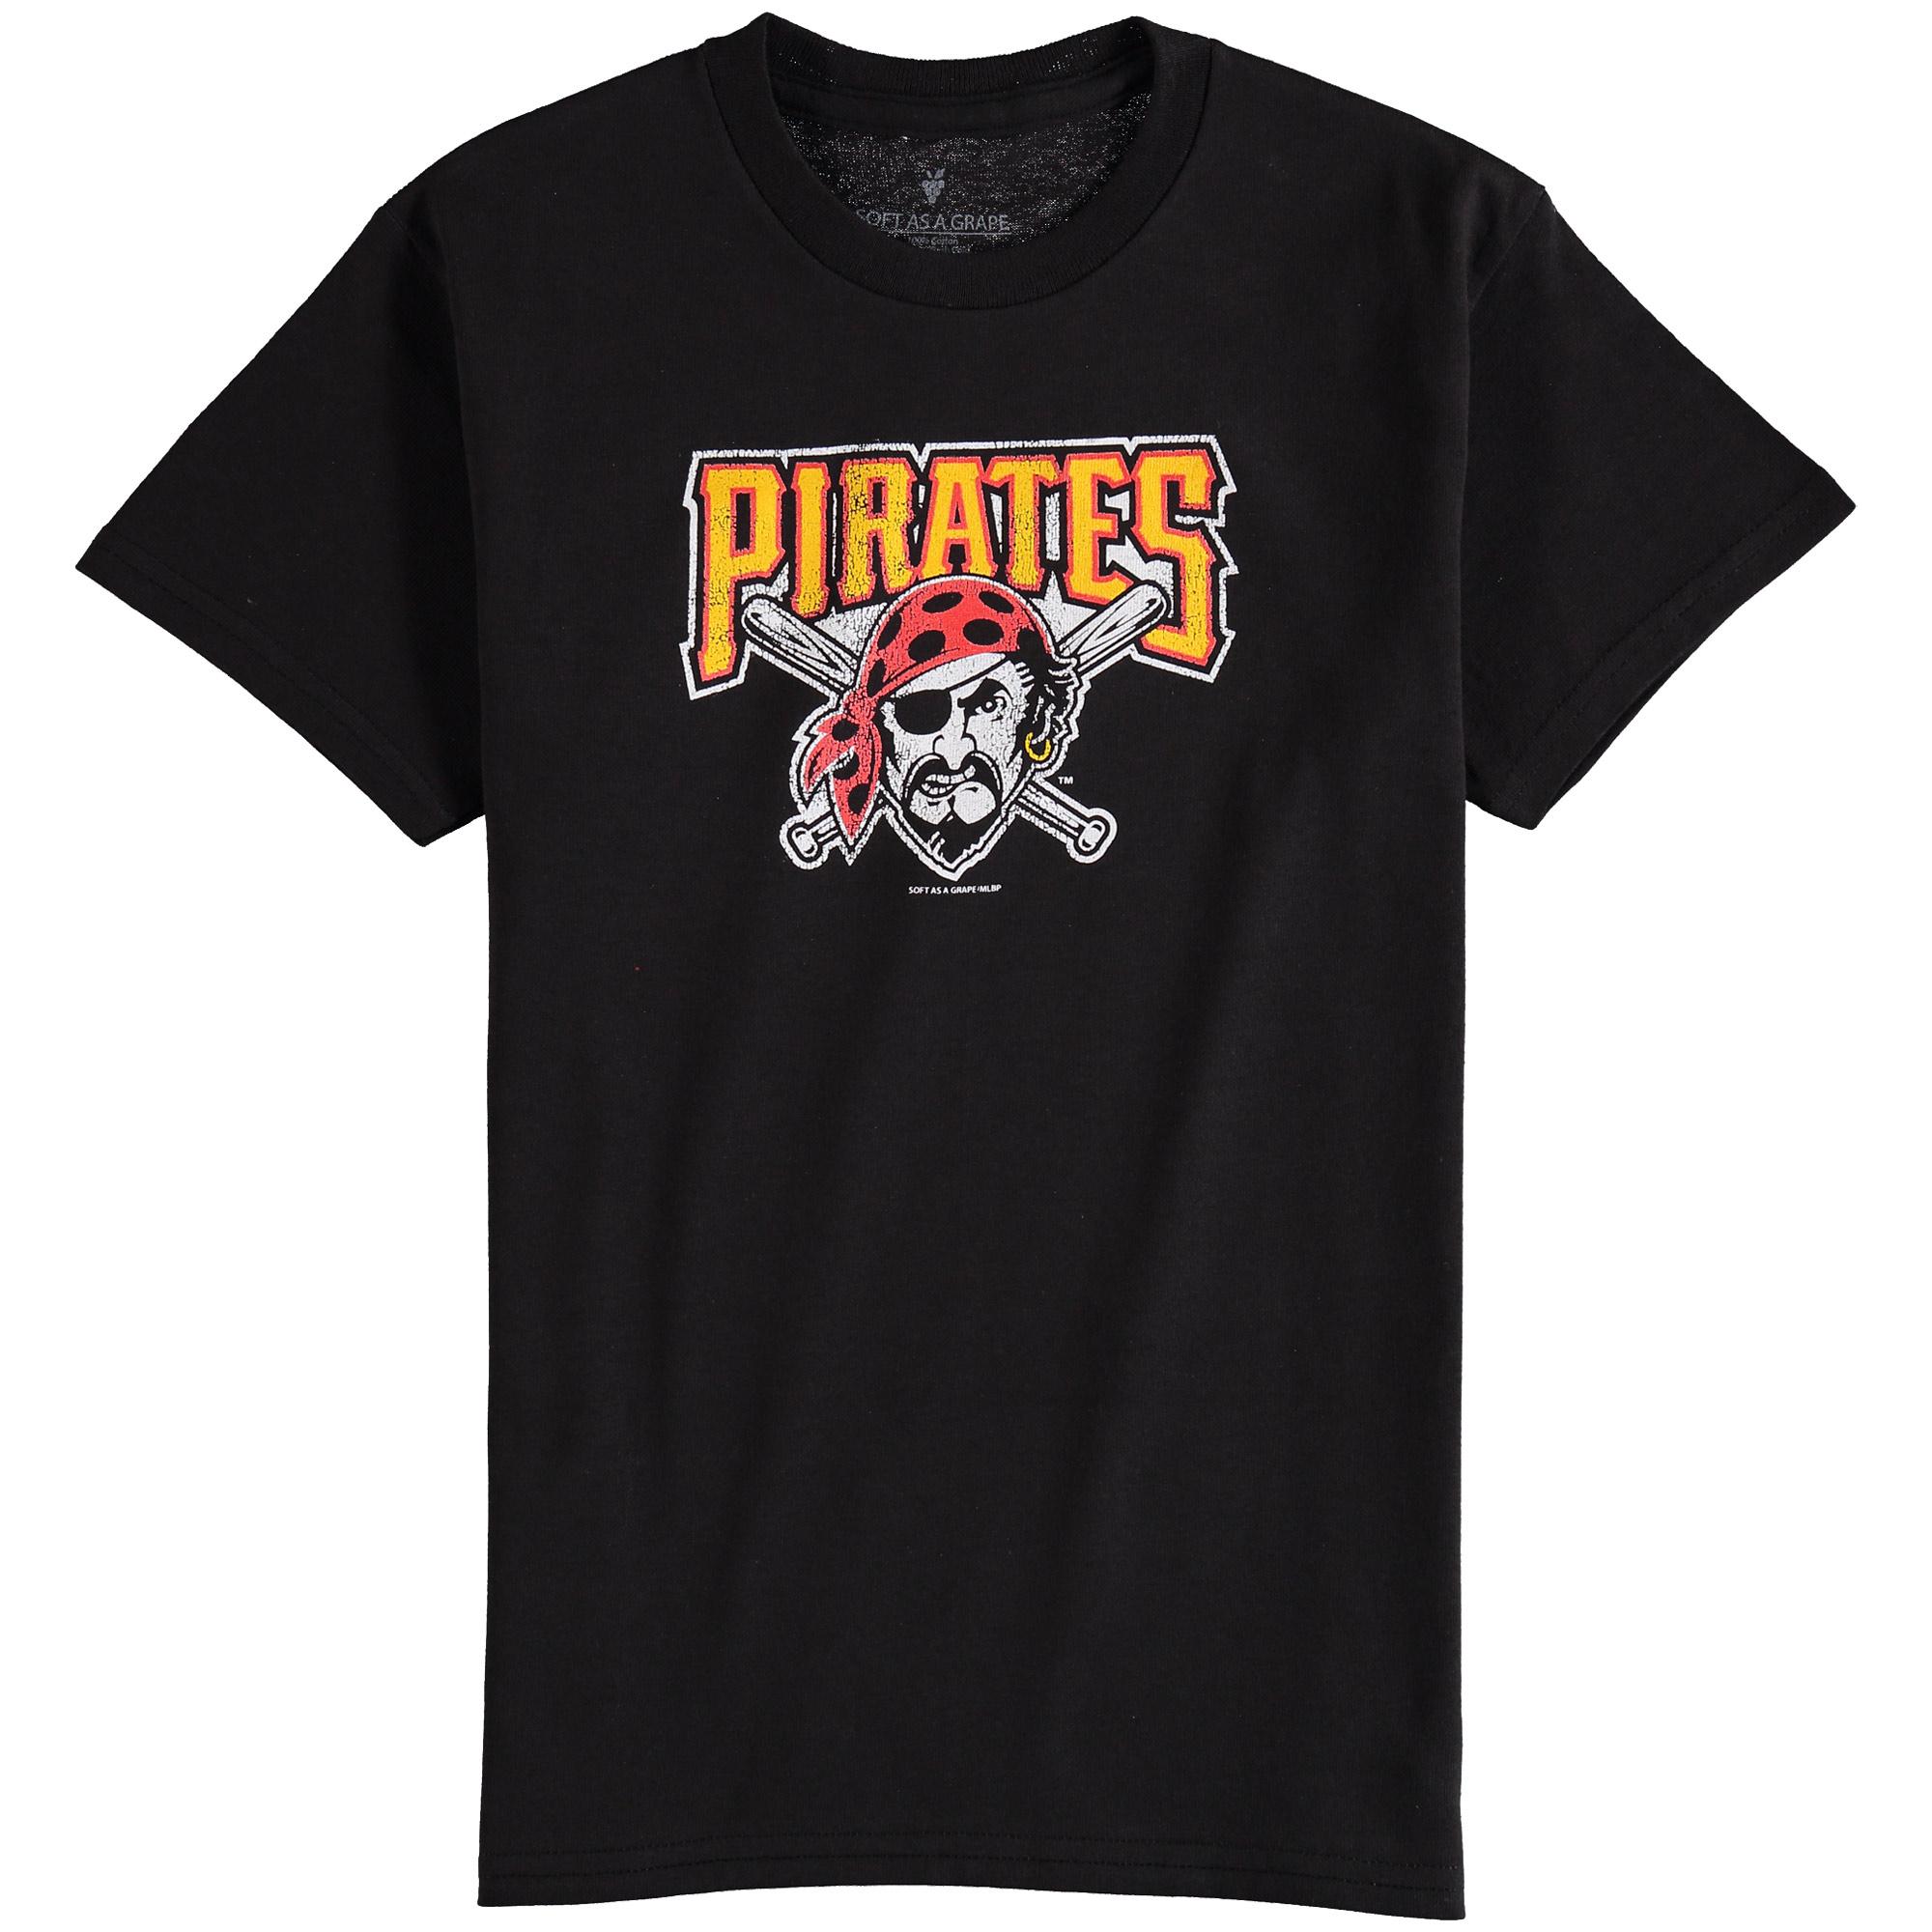 Pittsburgh Pirates Youth Distressed Logo T-Shirt - Black